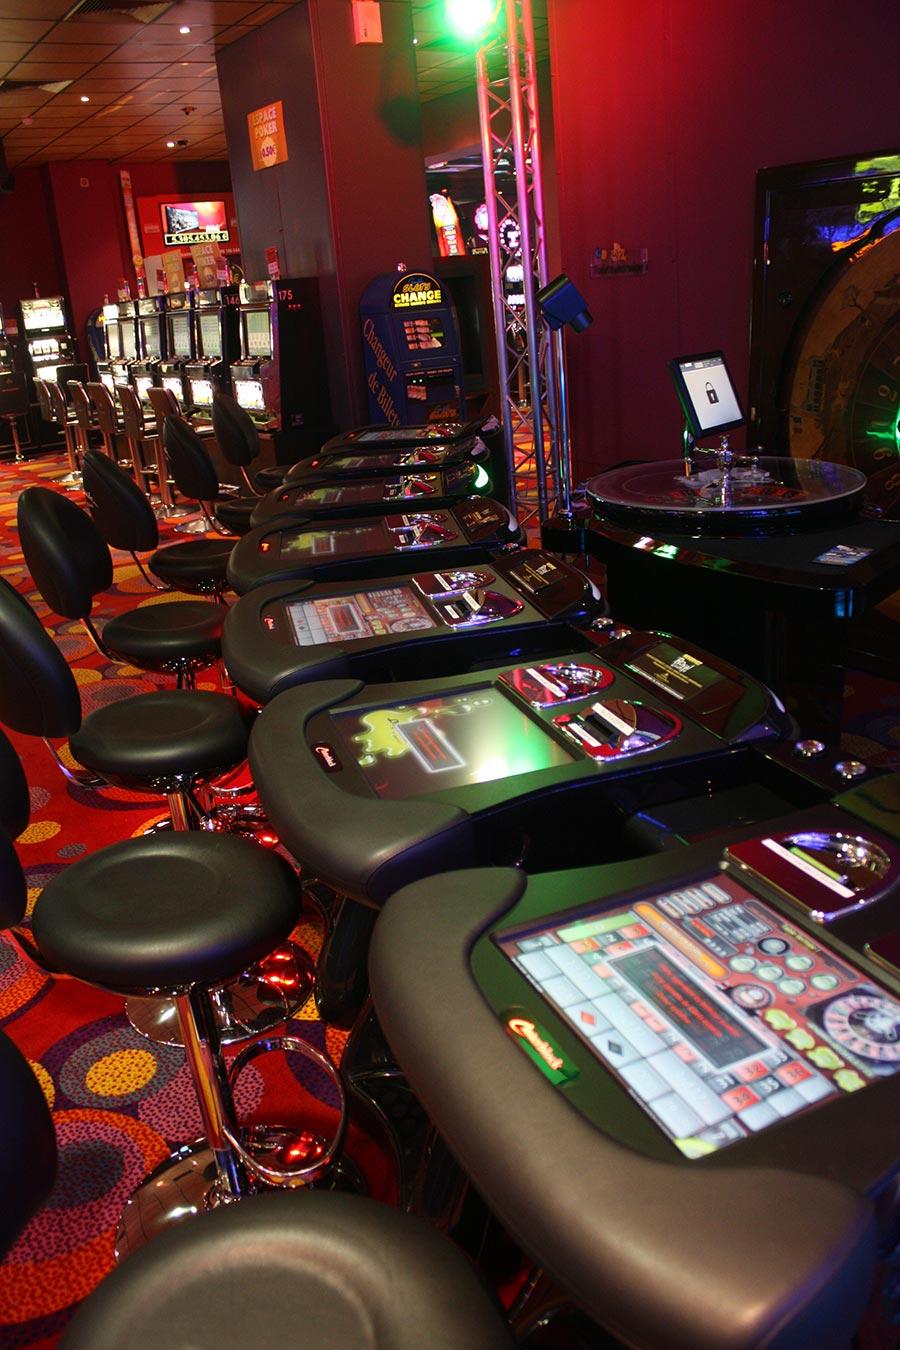 Nery les bains casino omaha poker games in las vegas